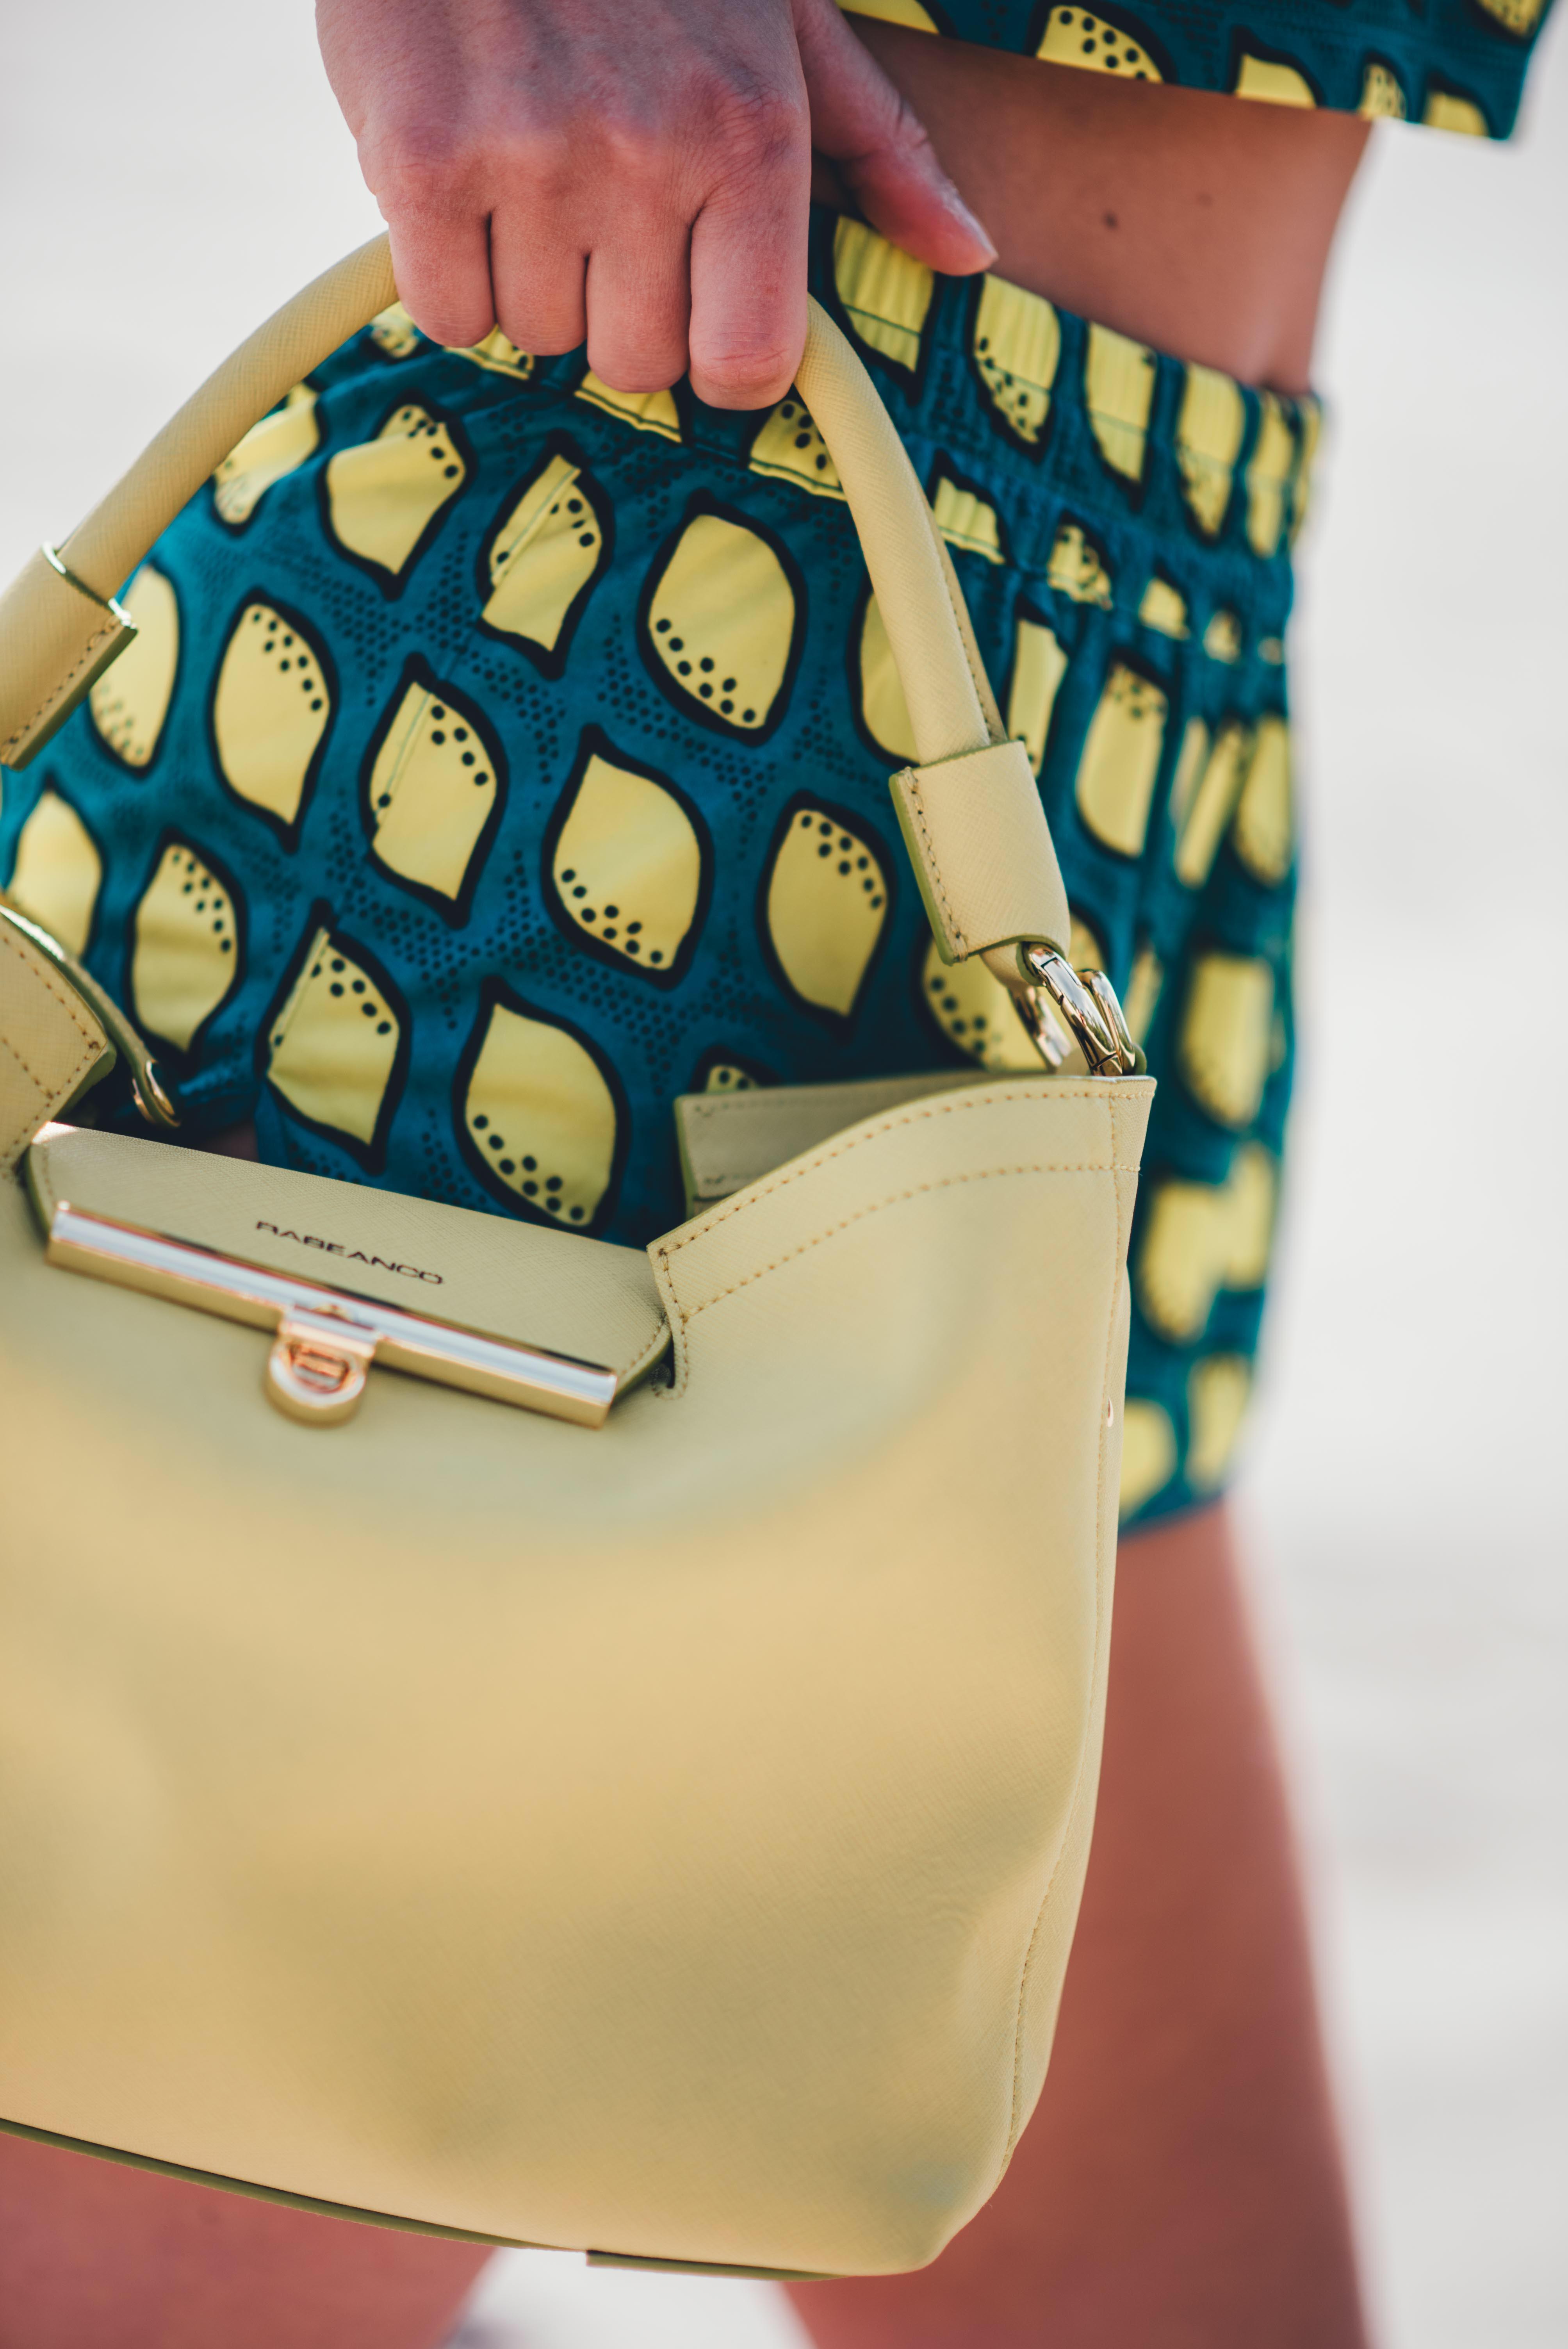 Rabeanco, bag, bags, tas, tassen, leer, leather, ootd, outfit, accessoire, accessoires, xmariekie, blog, blogger